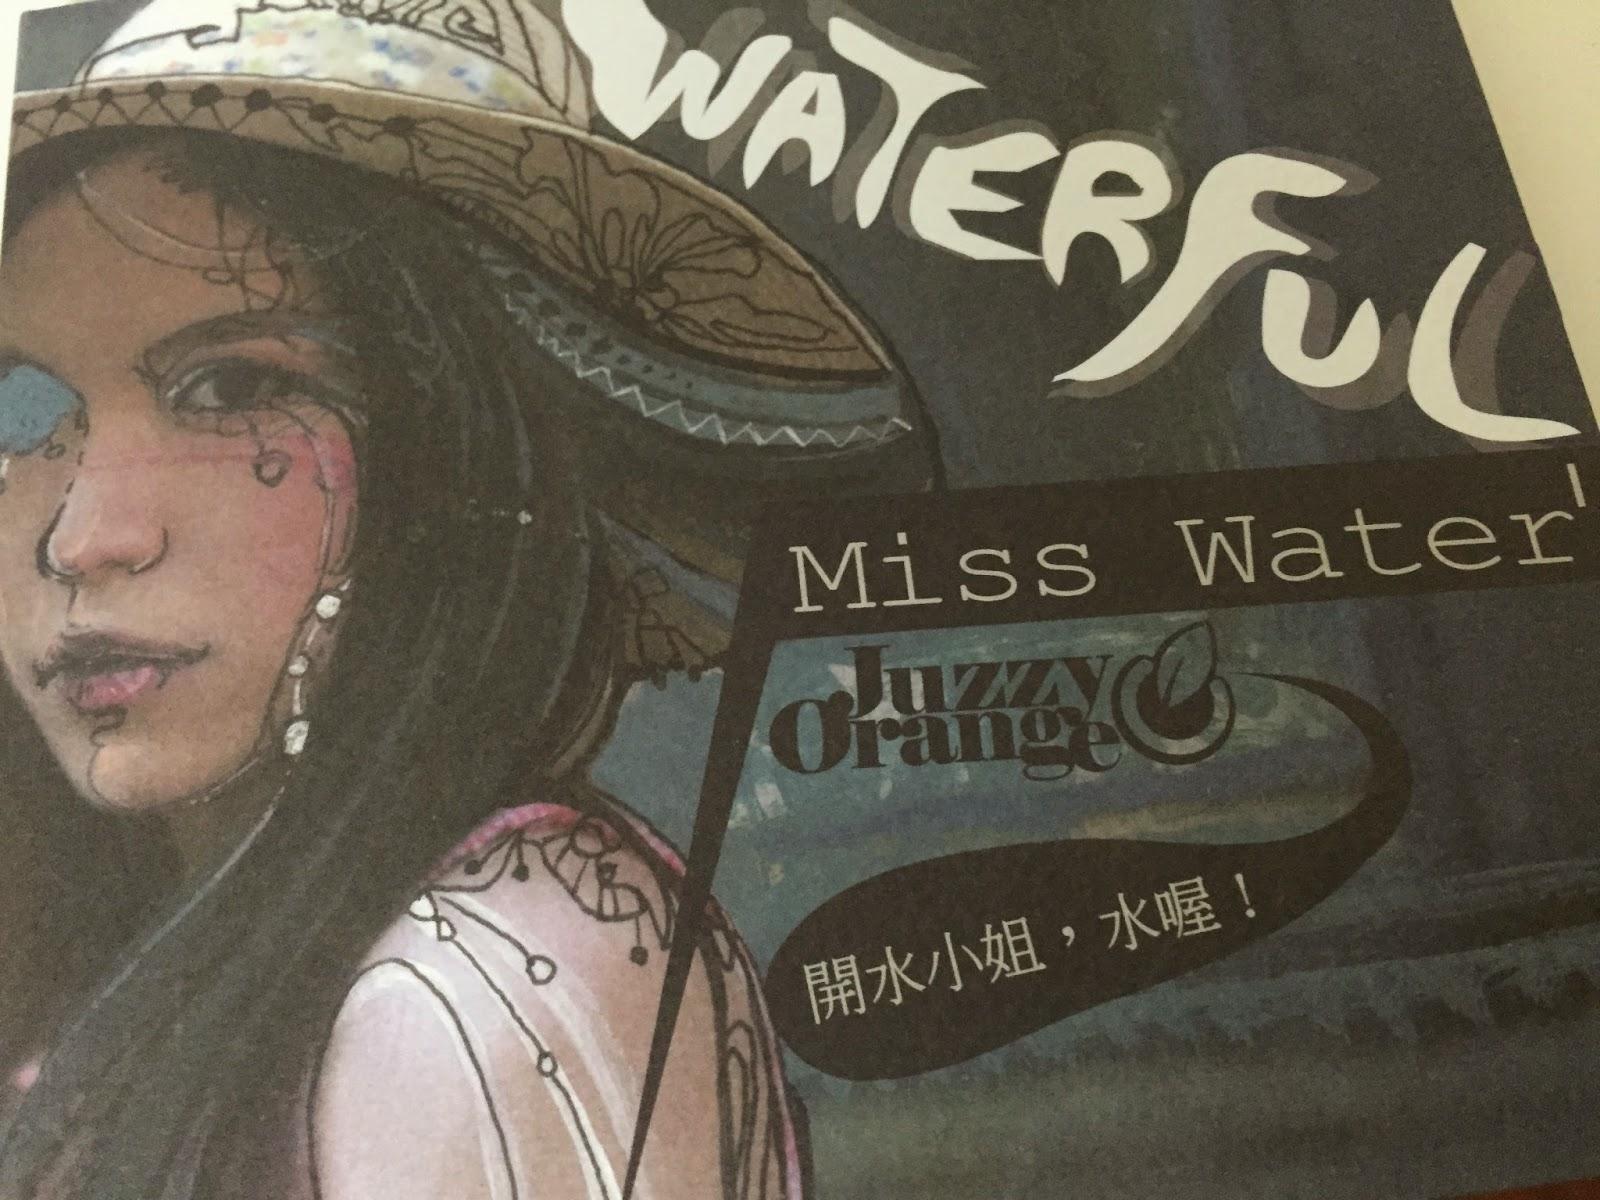 WOOHAA!TAIWAN...The Urban Muziq Blog: [WOOHAA一言堂] 2014年臺灣饒舌作品回顧